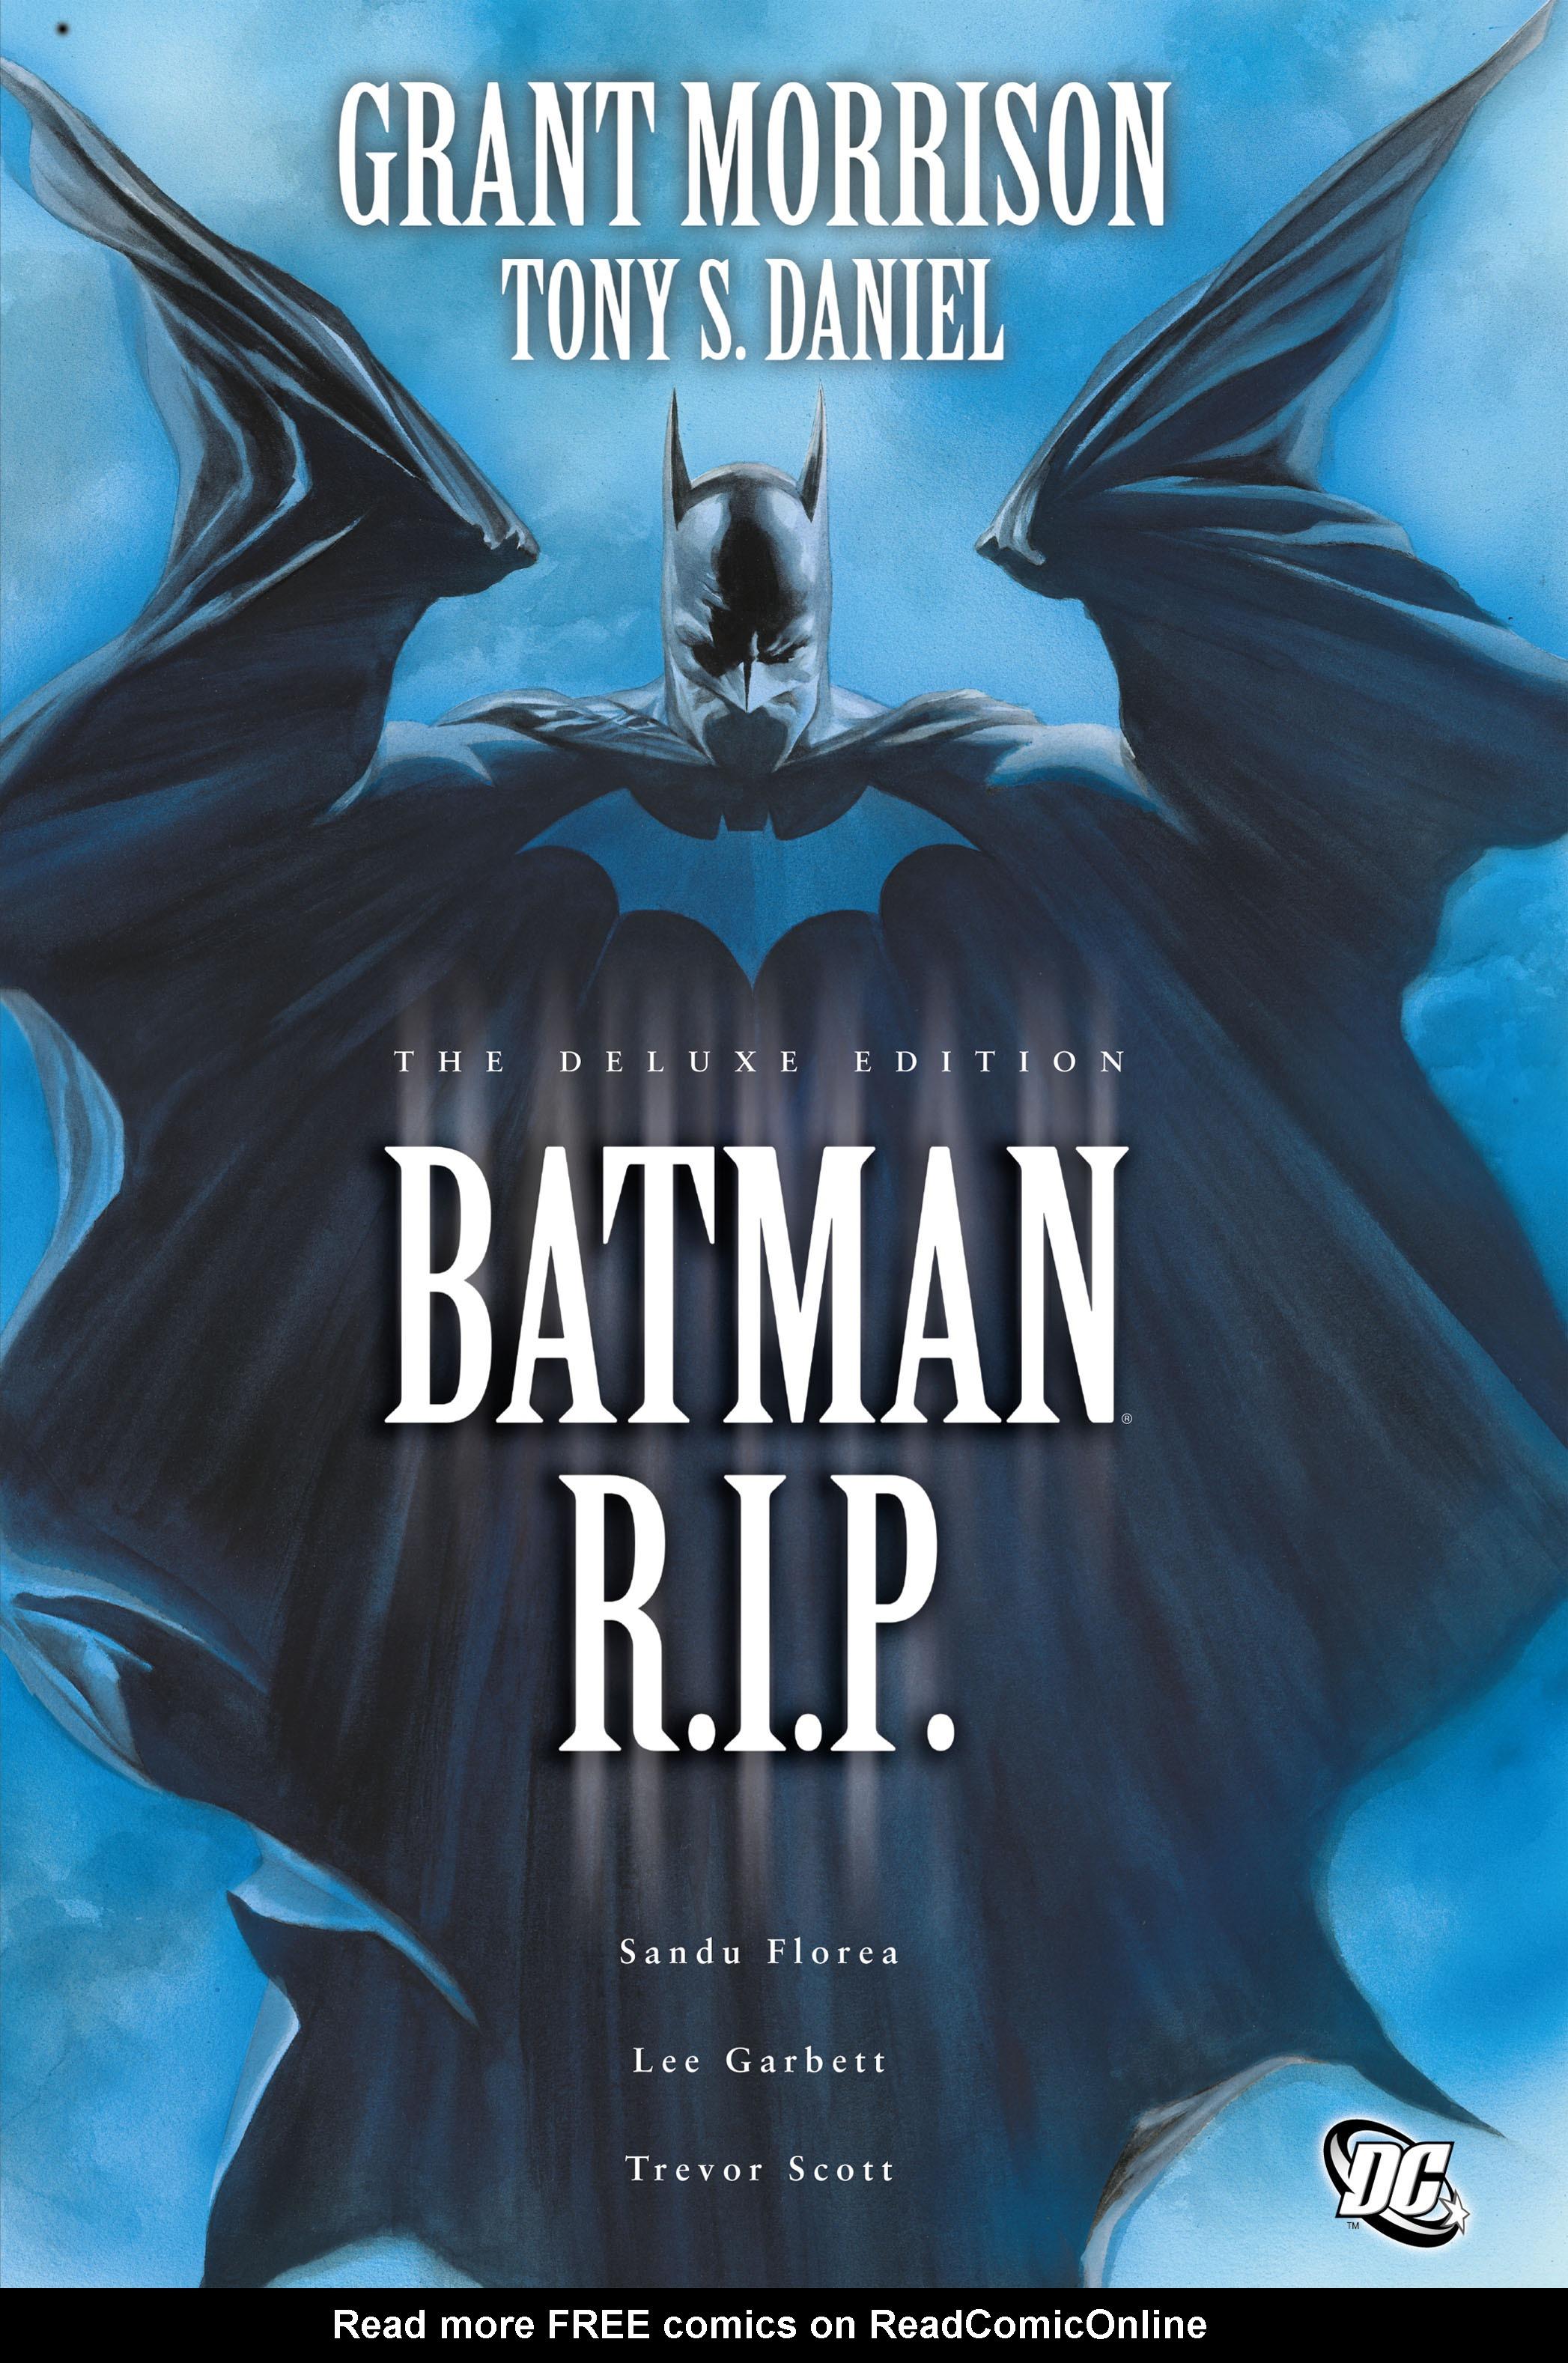 Batman: R.I.P. TPB Page 1